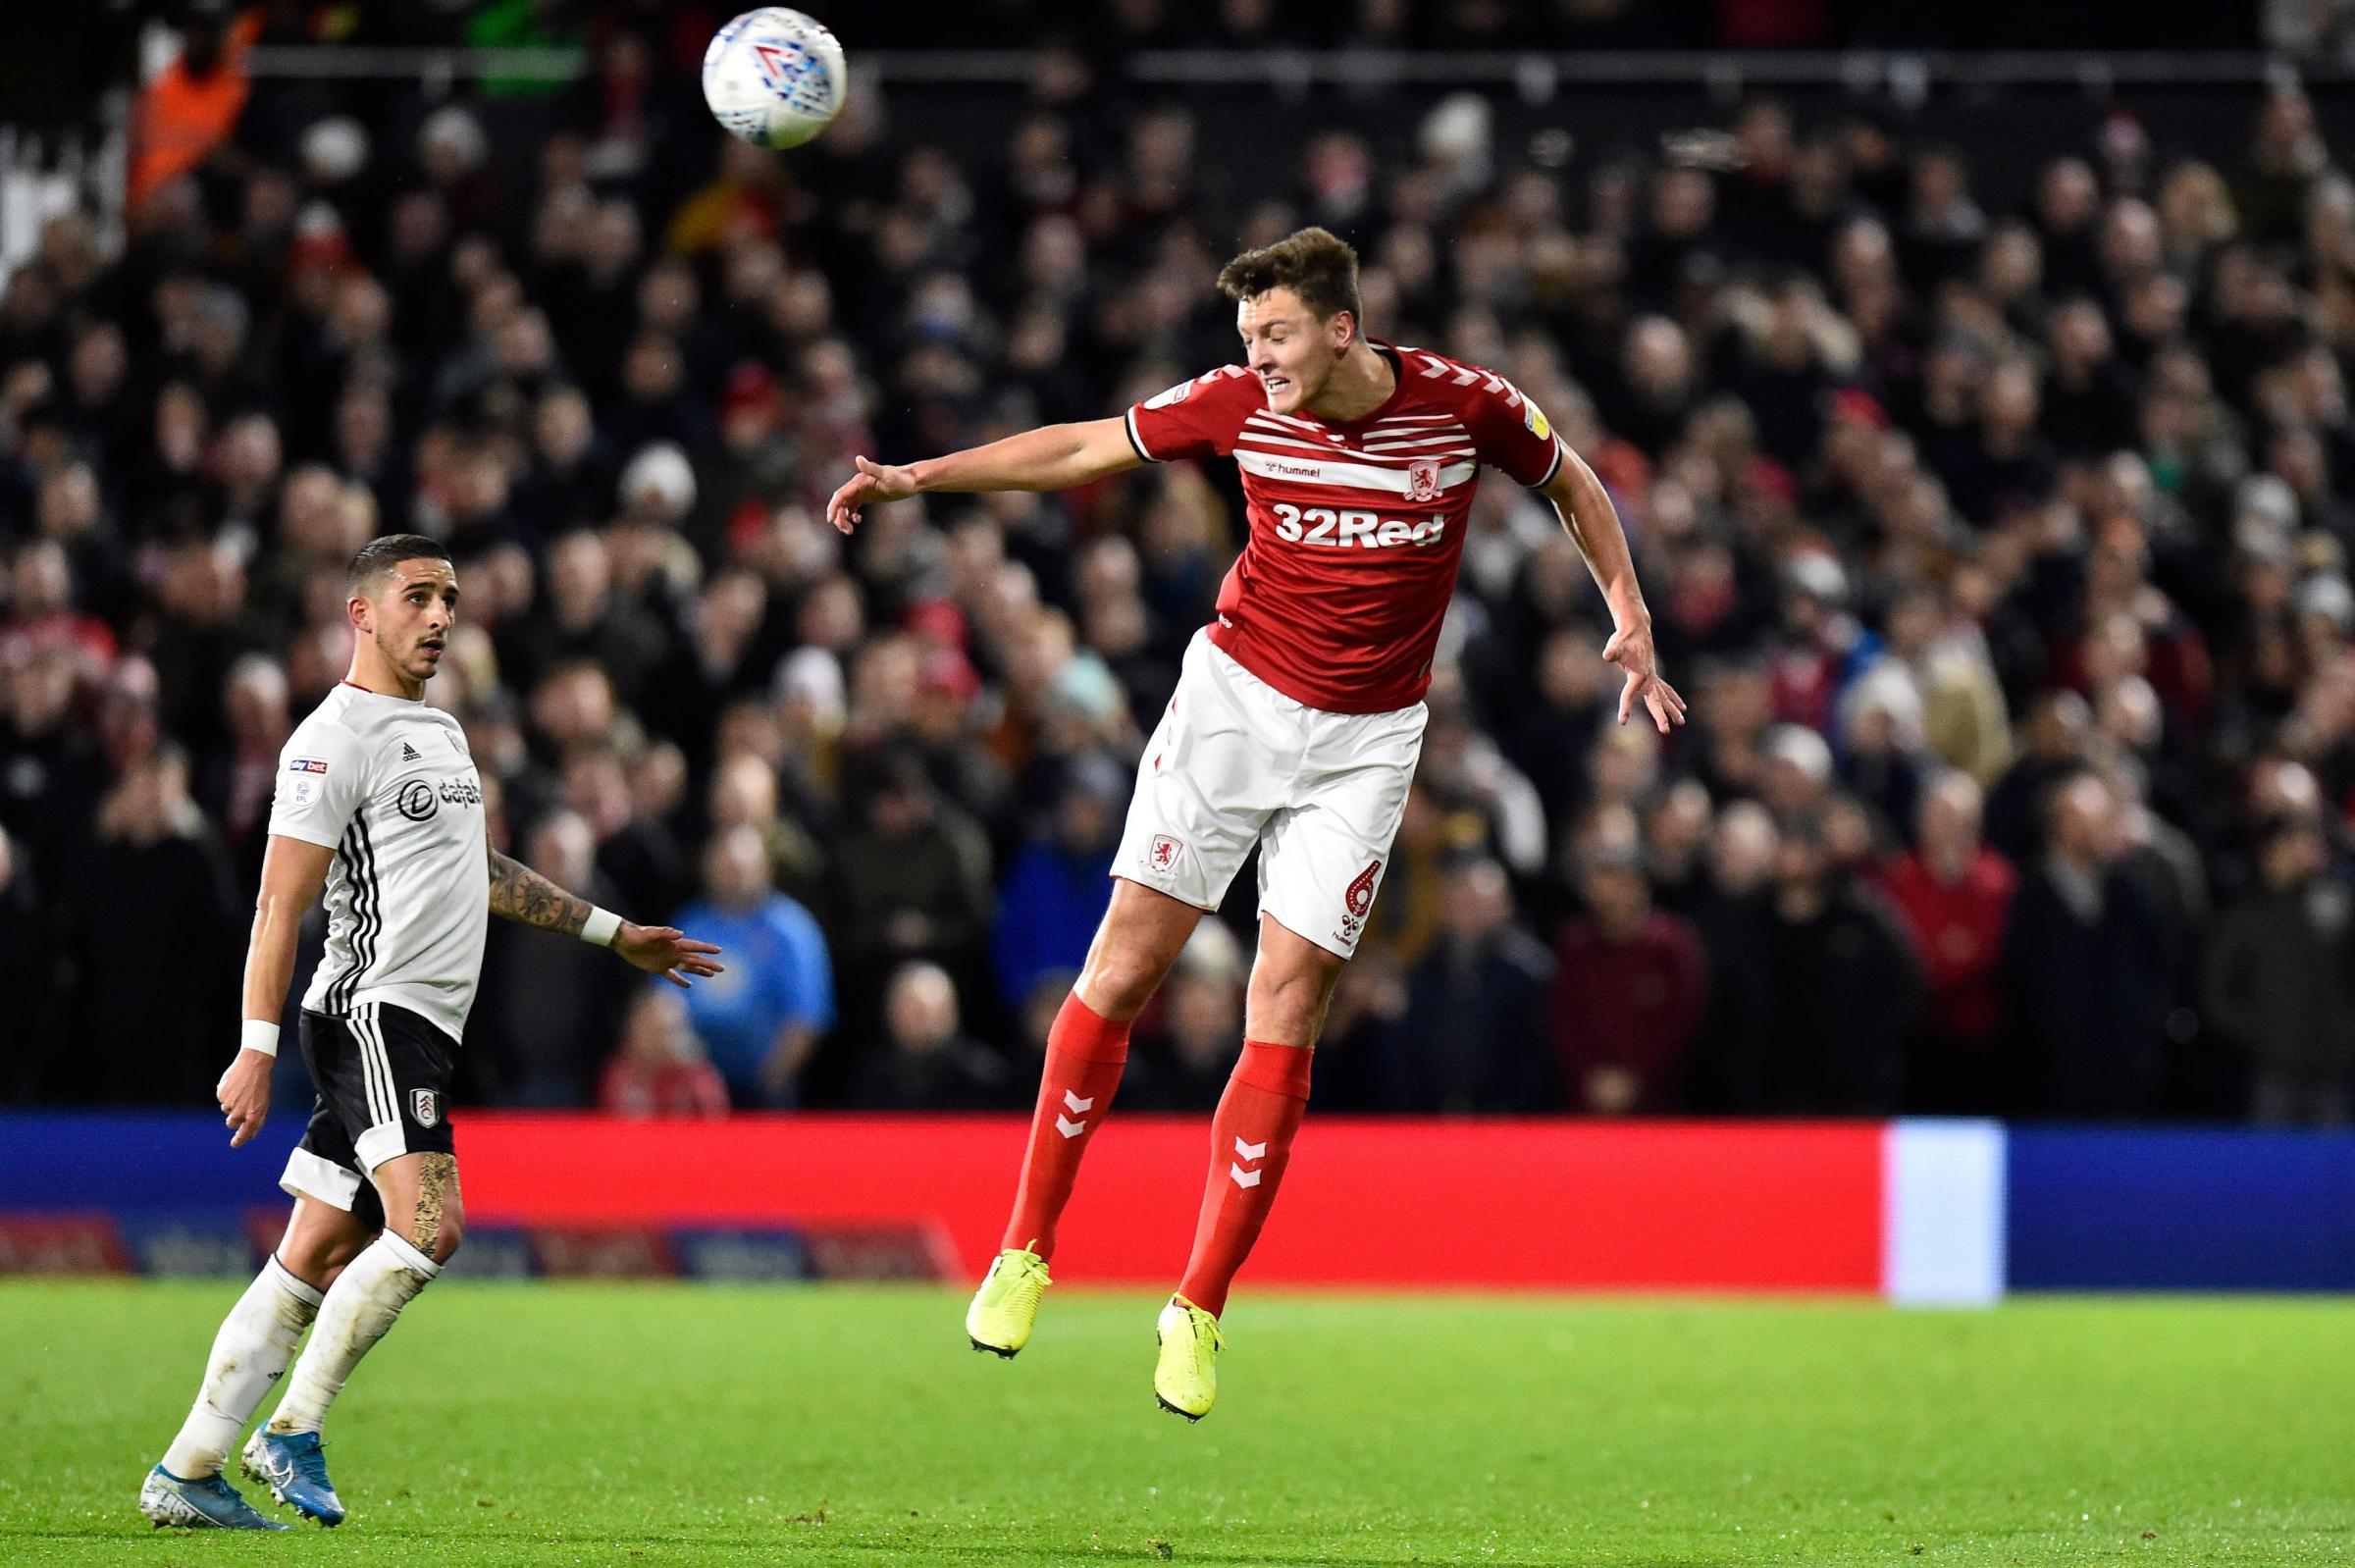 Middlesbrough transfer news: Fry on Burnley radar - again